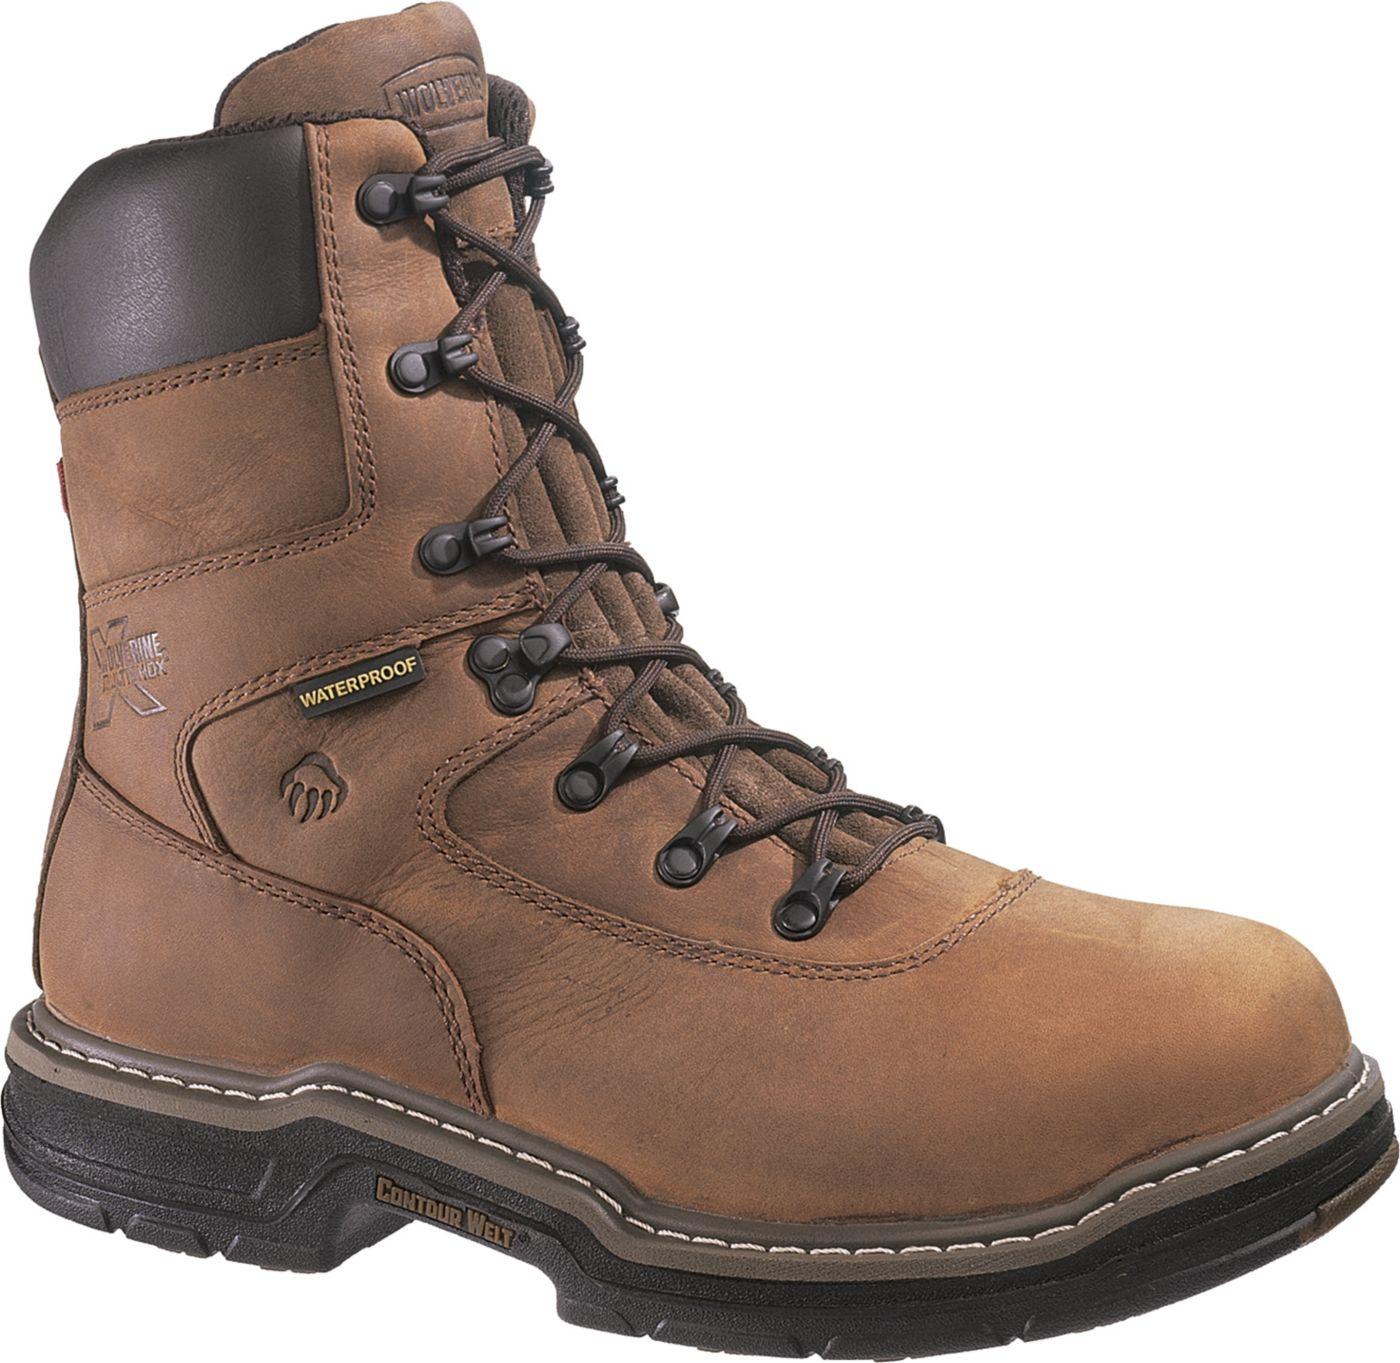 "Wolverine Men's Marauder 8"" Steel Toe 400g Insulated Waterproof Work Boots"